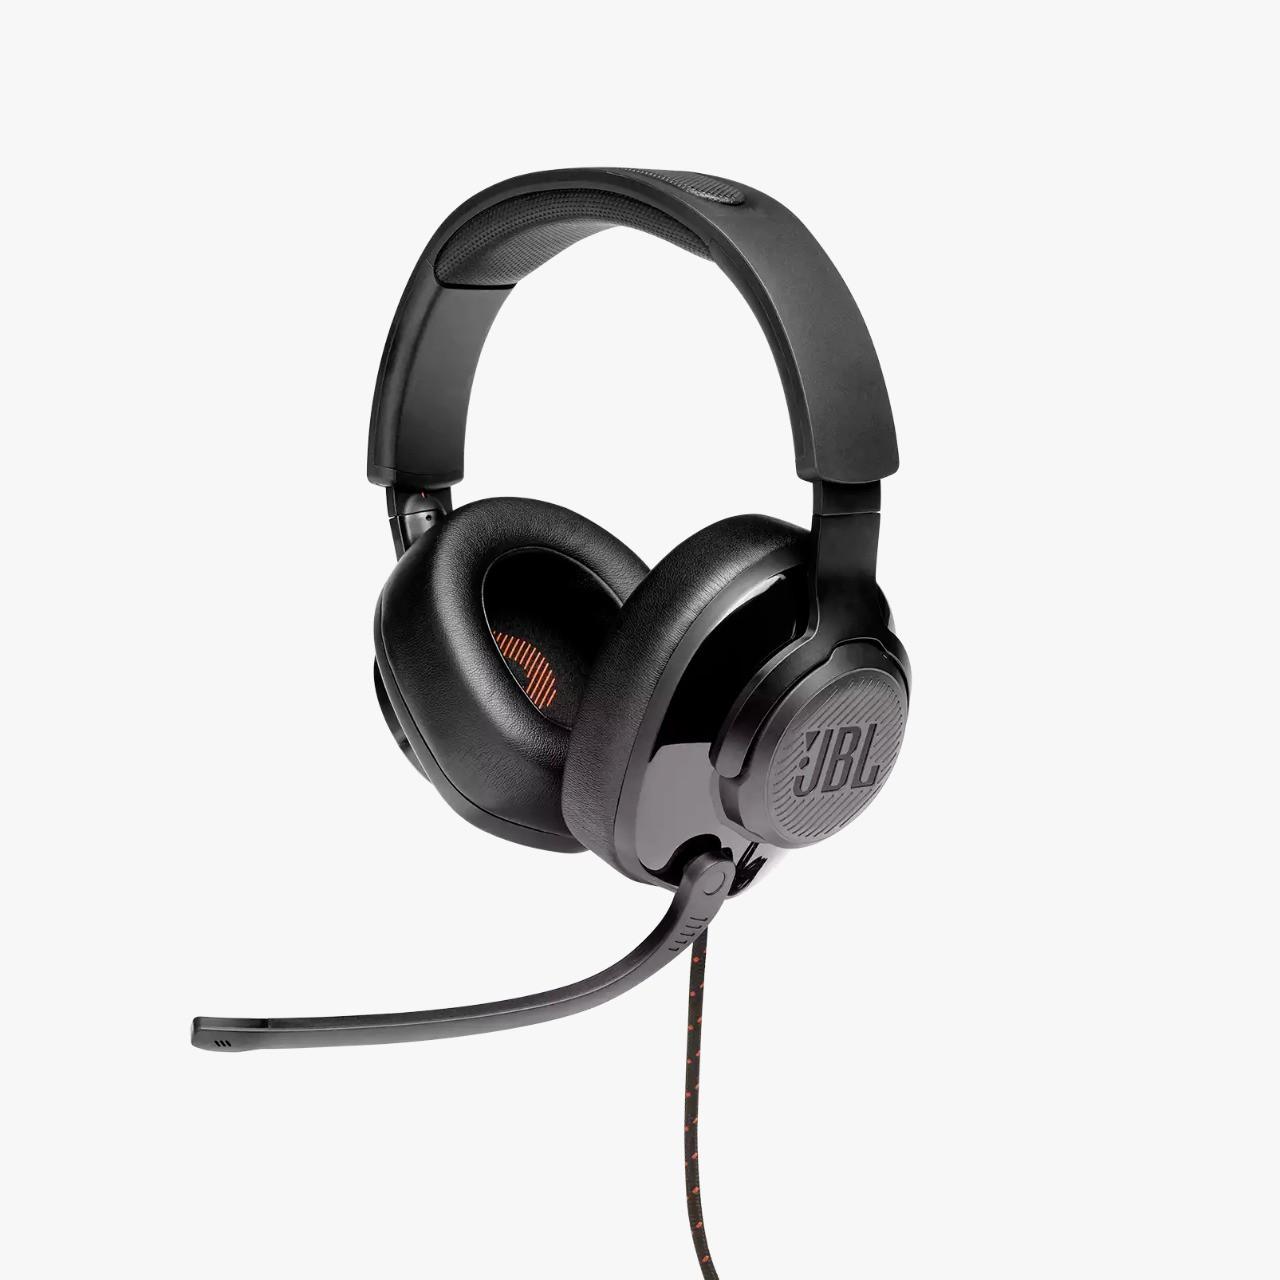 Headset Gamer Jbl Quantum 300, Driver 50mm, Preto - 28913177